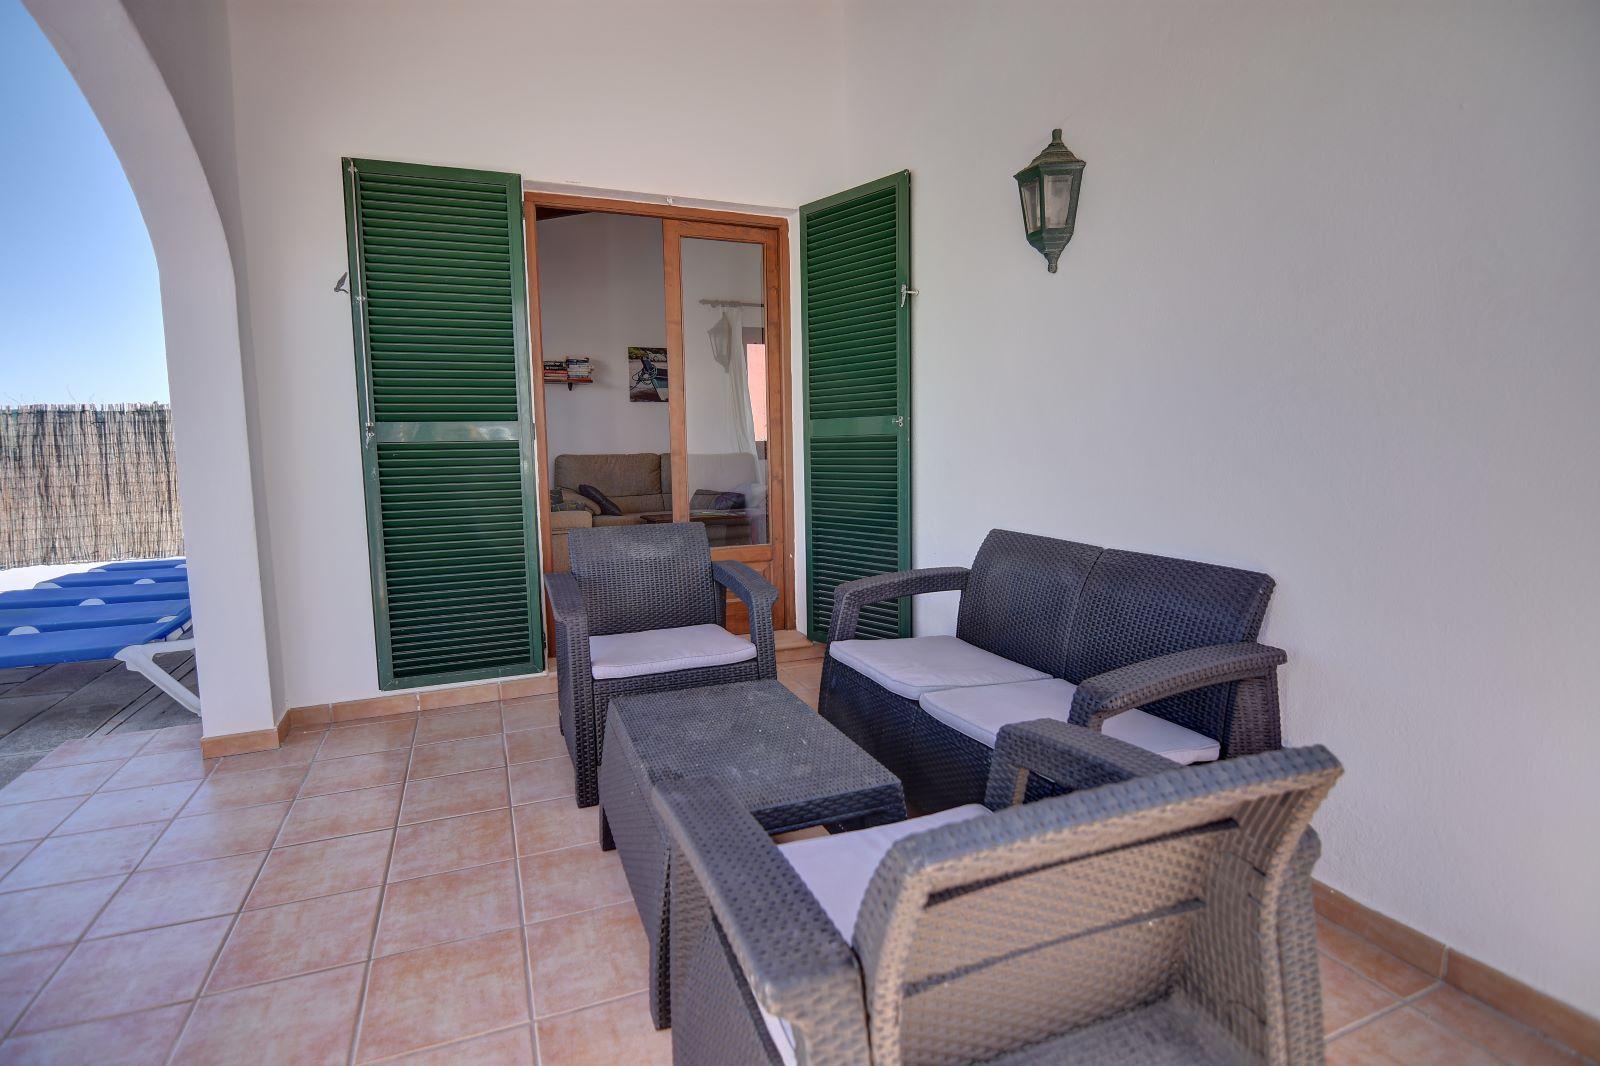 Villa in Cap D'Artruitx Ref: H2589 12